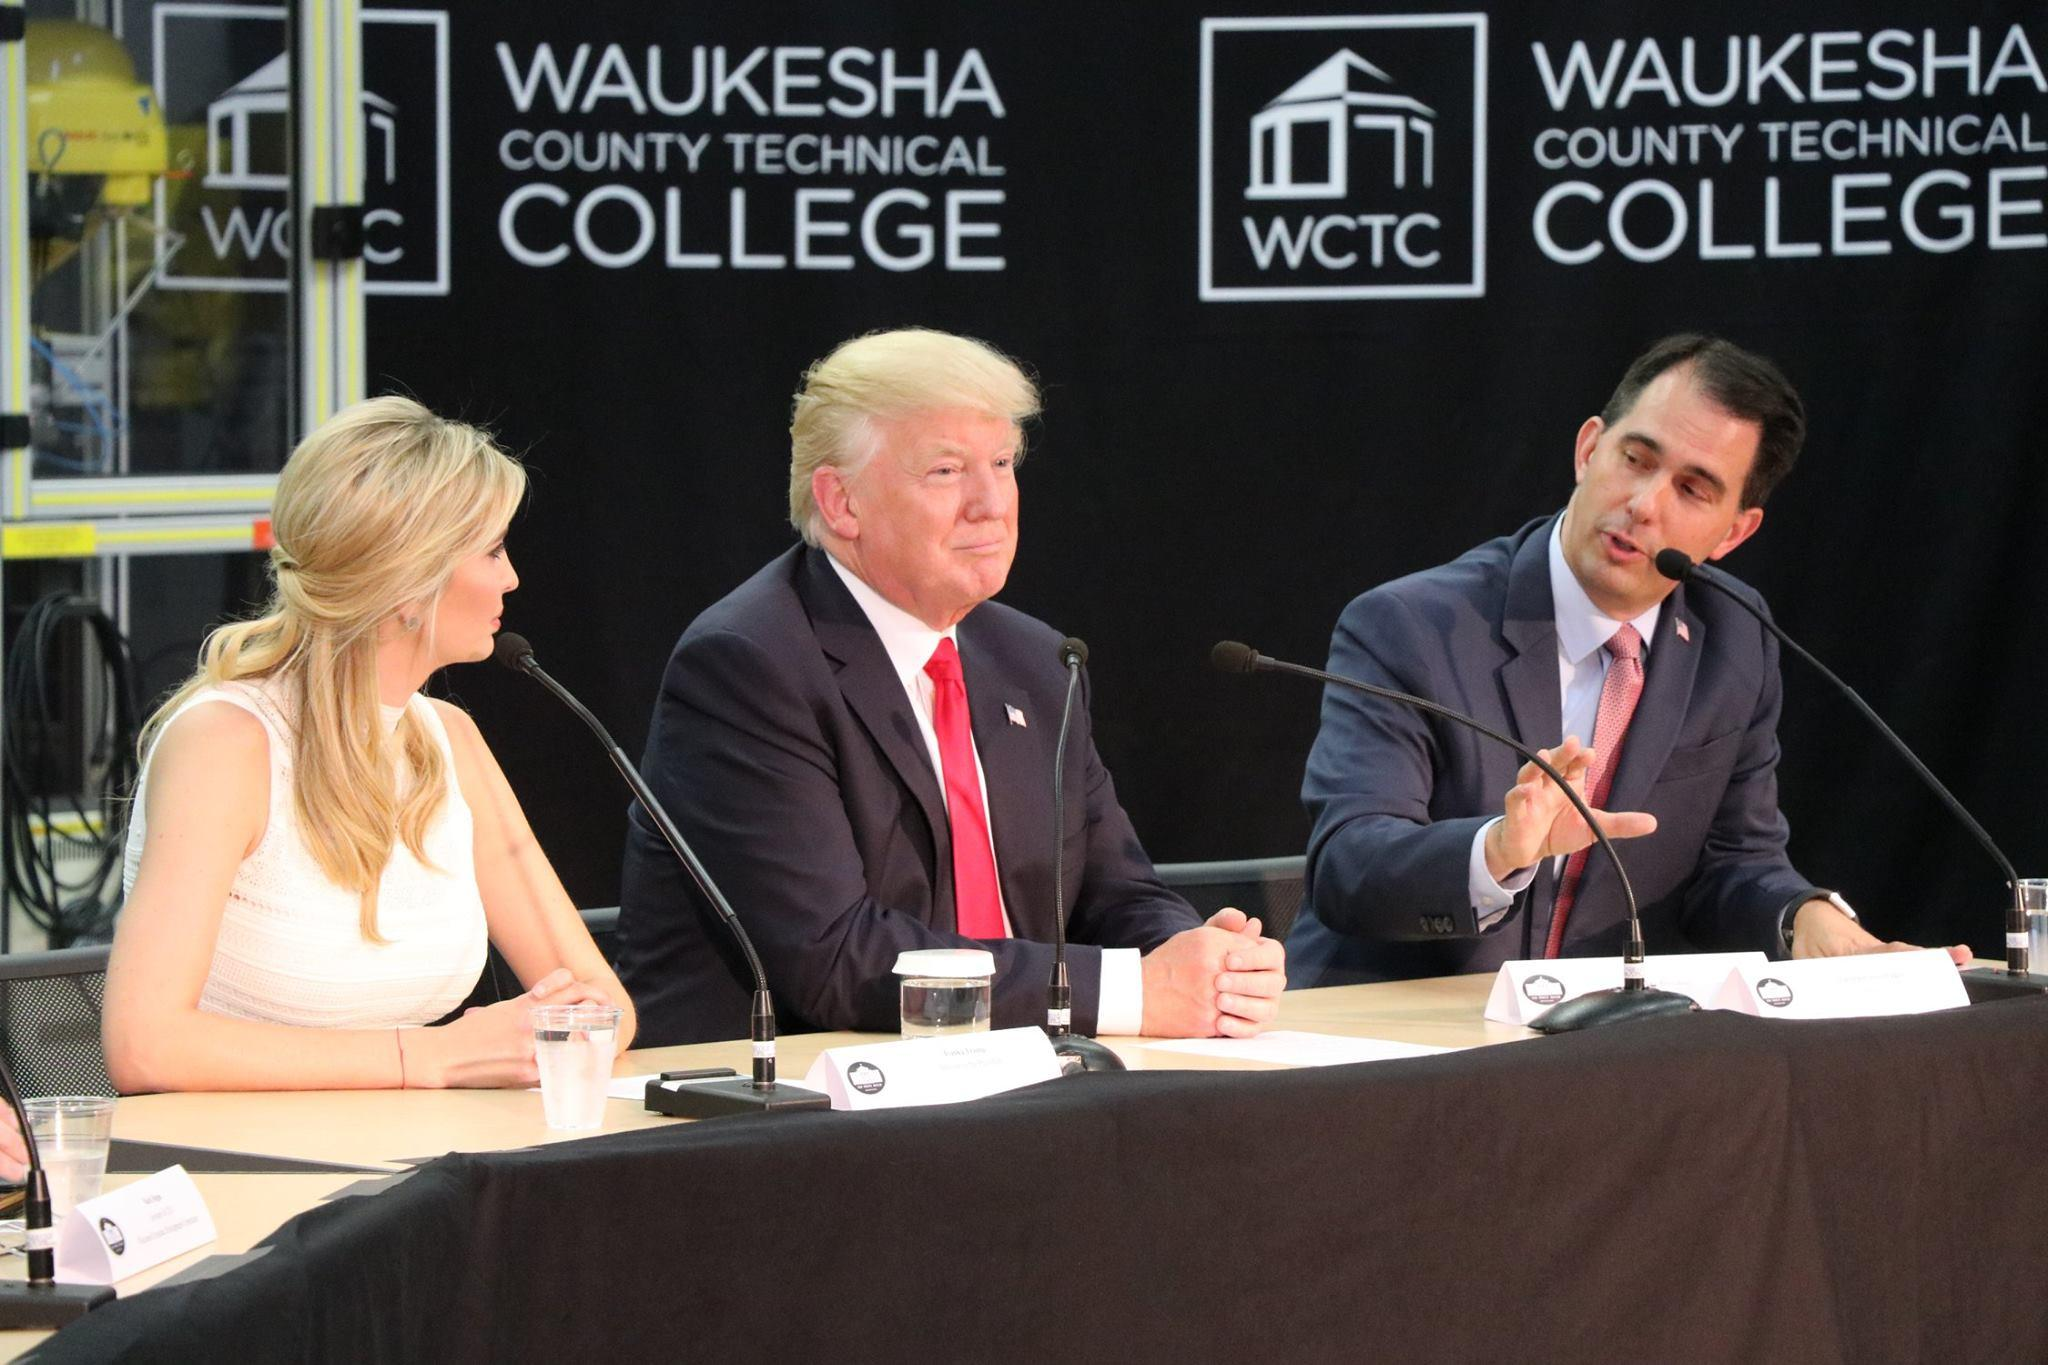 Hasil gambar untuk President Trump tours Waukesha County Technical College